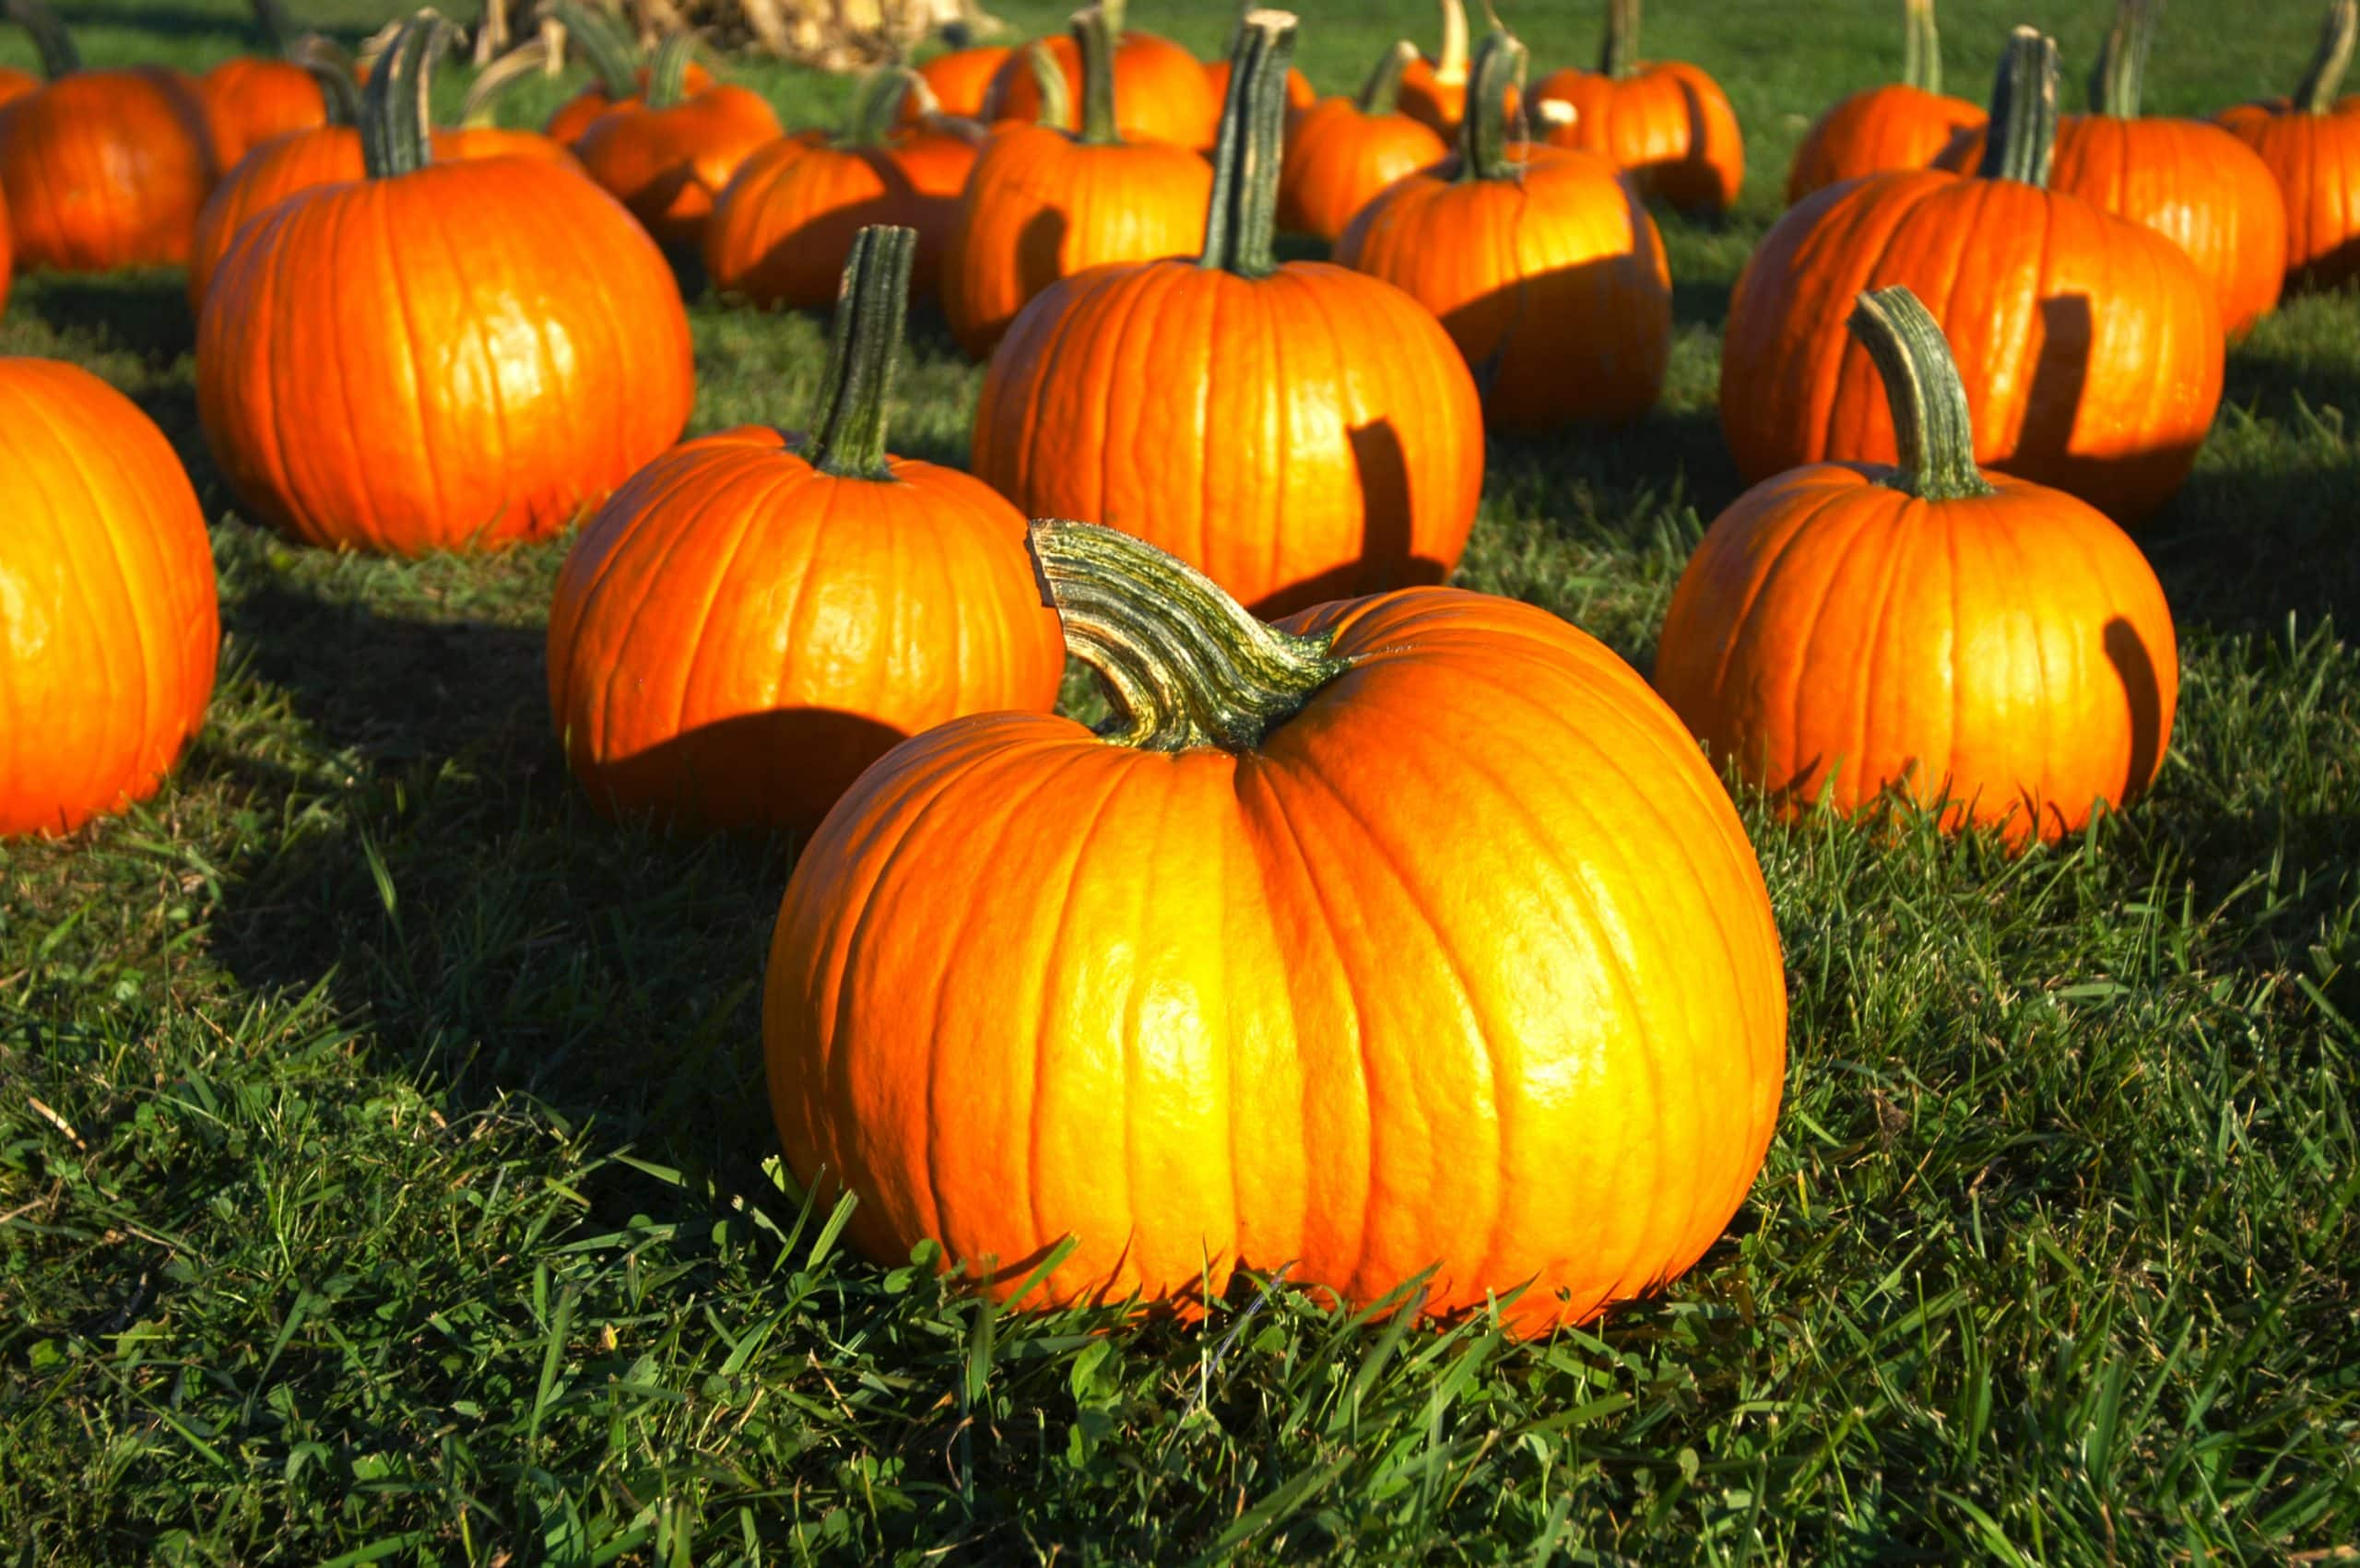 Twin Pumpkin at Bengtson Farm